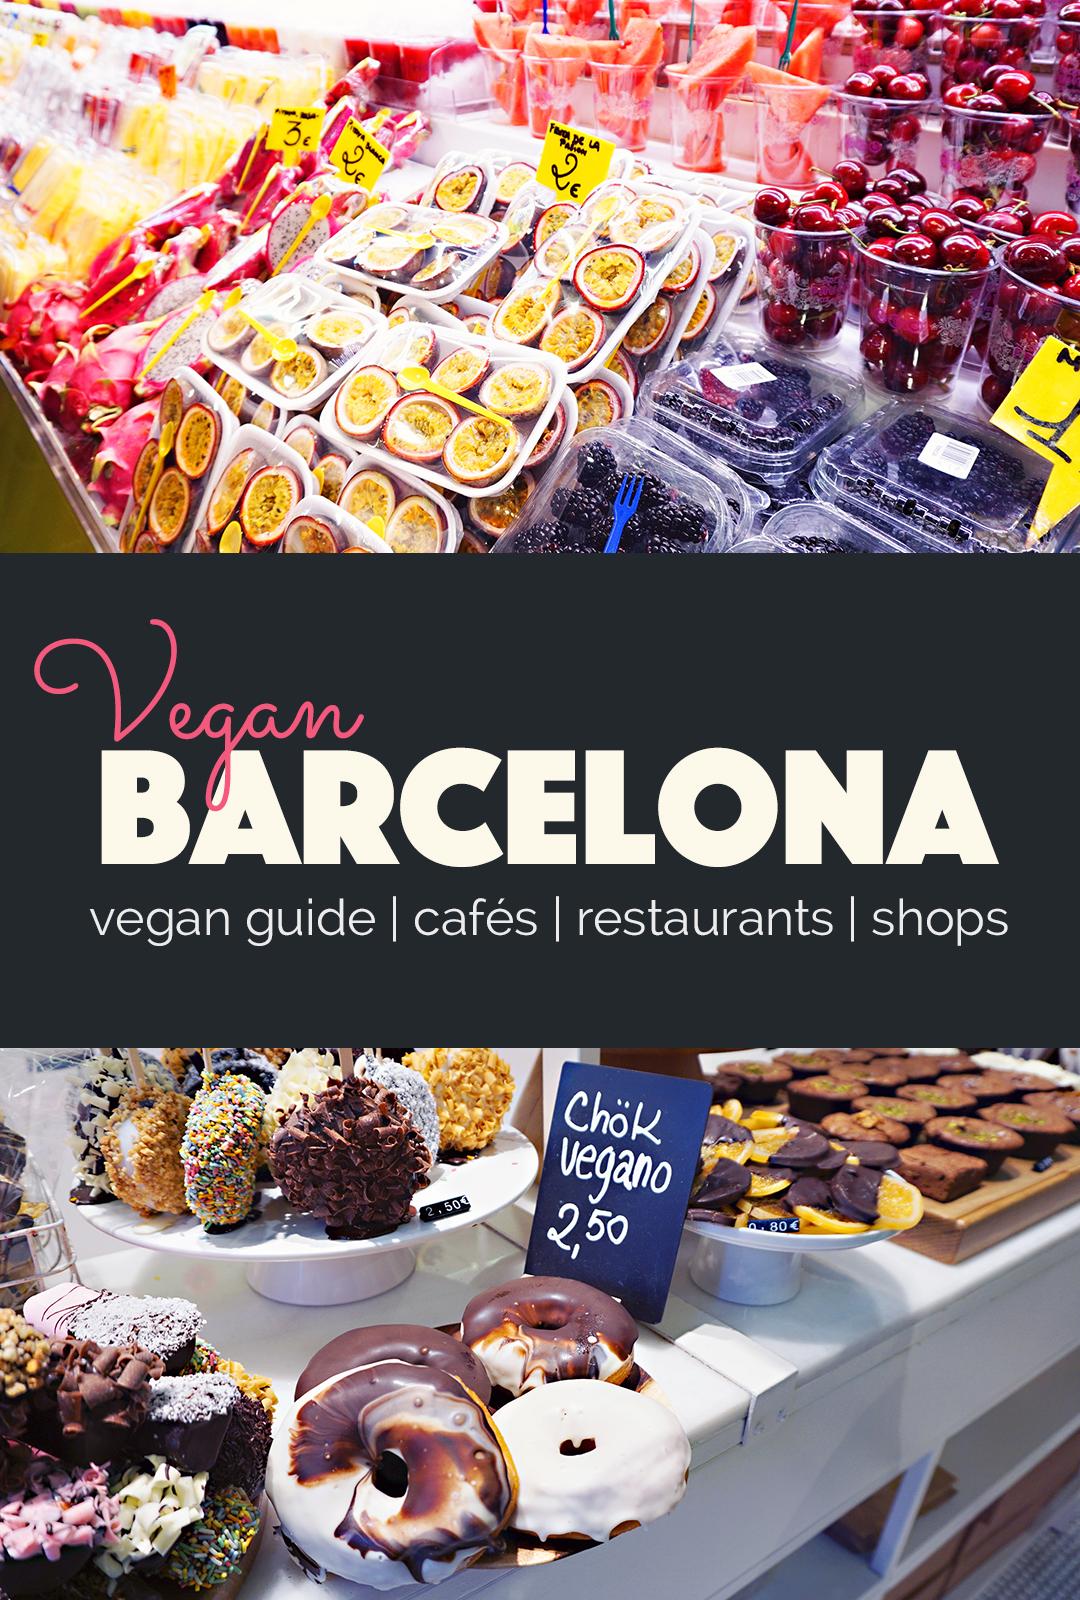 Vegan Guide to Barcelona   http://BananaBloom.com #veganguide #vegantravel #vegan #barcelona